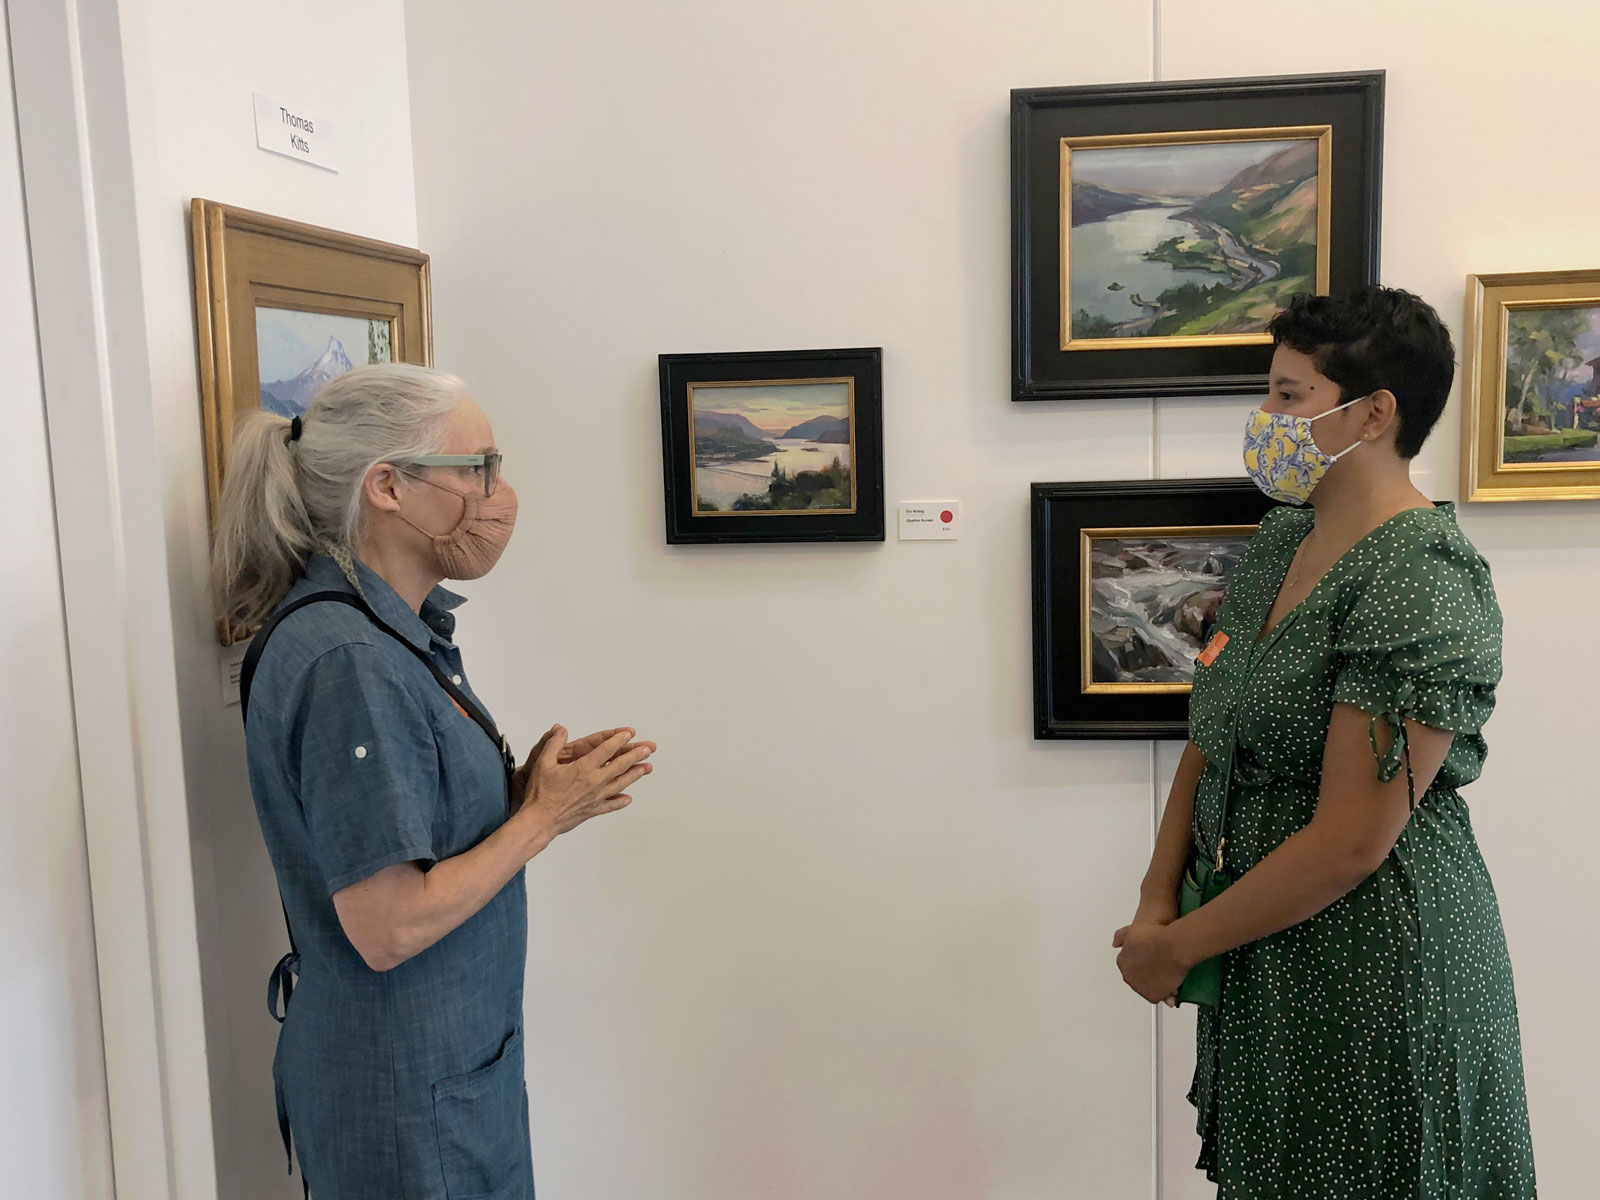 Friends Board Member Lisa Platt (left) and Outdoor Programs Specialist Melissa Gonzalez (right) discuss Elo's winning painting (center)